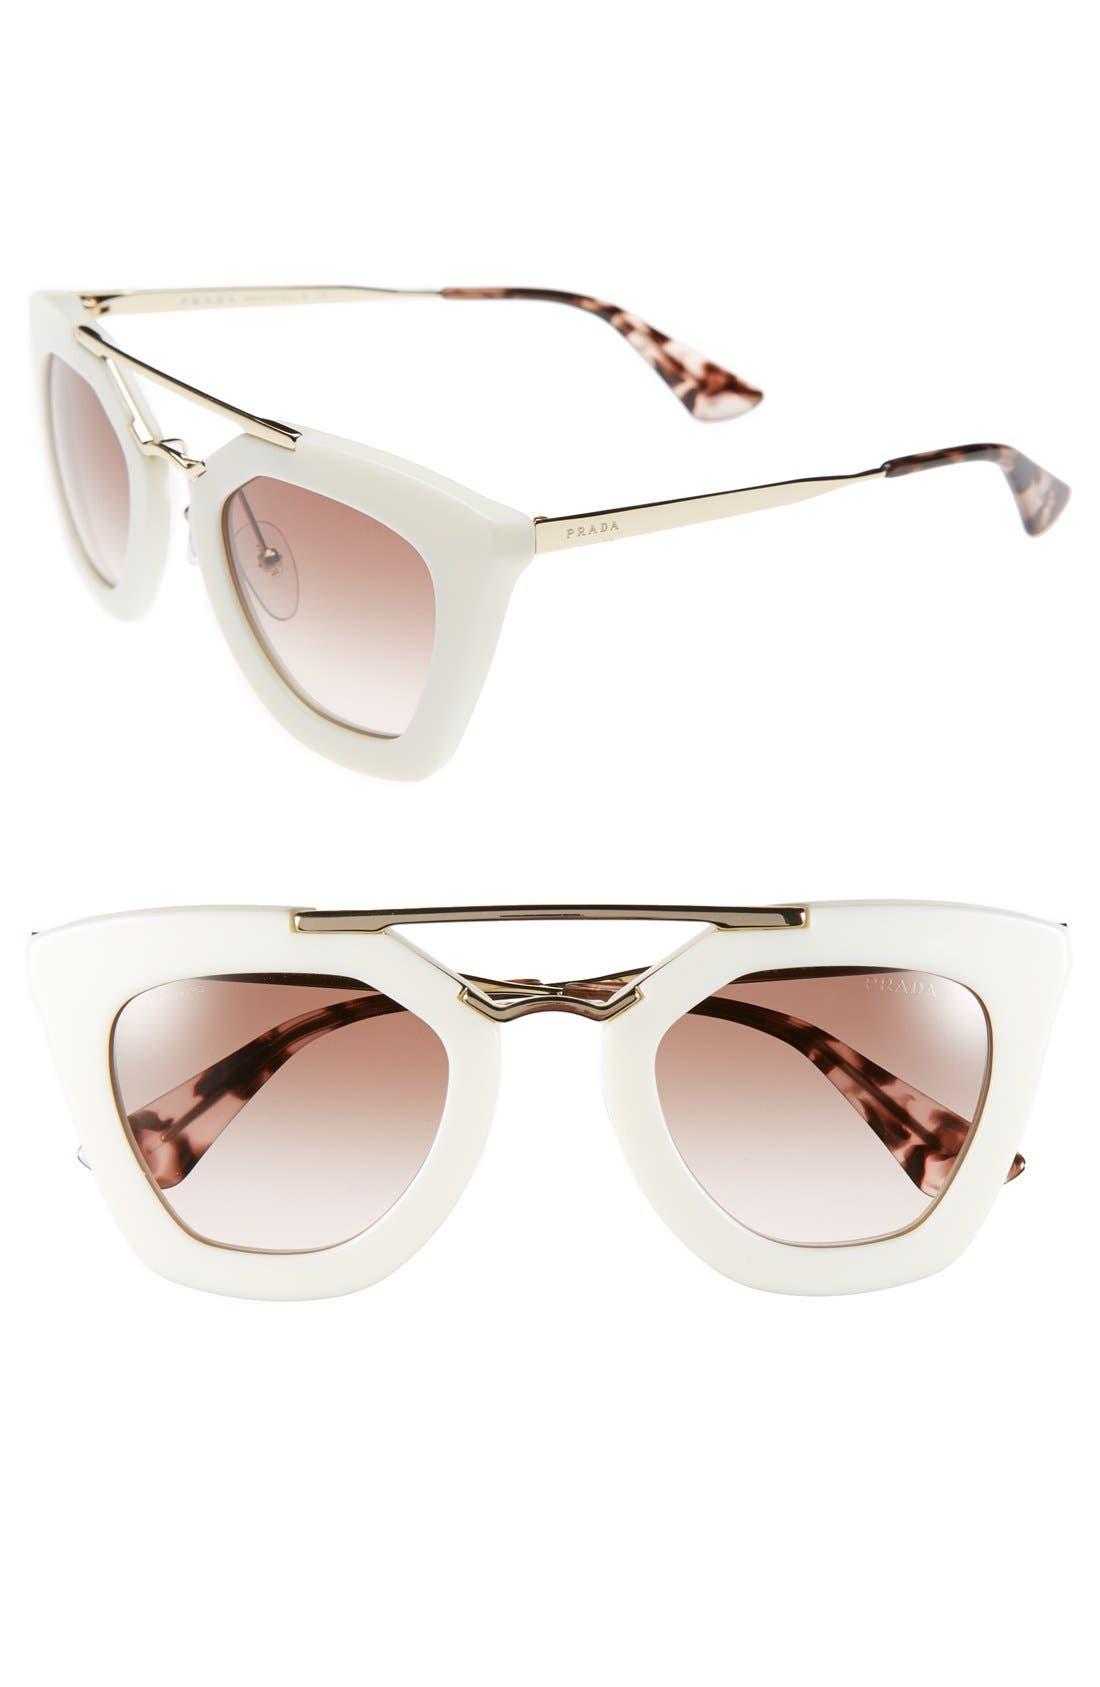 Main Image - Prada 49mm Retro Sunglasses